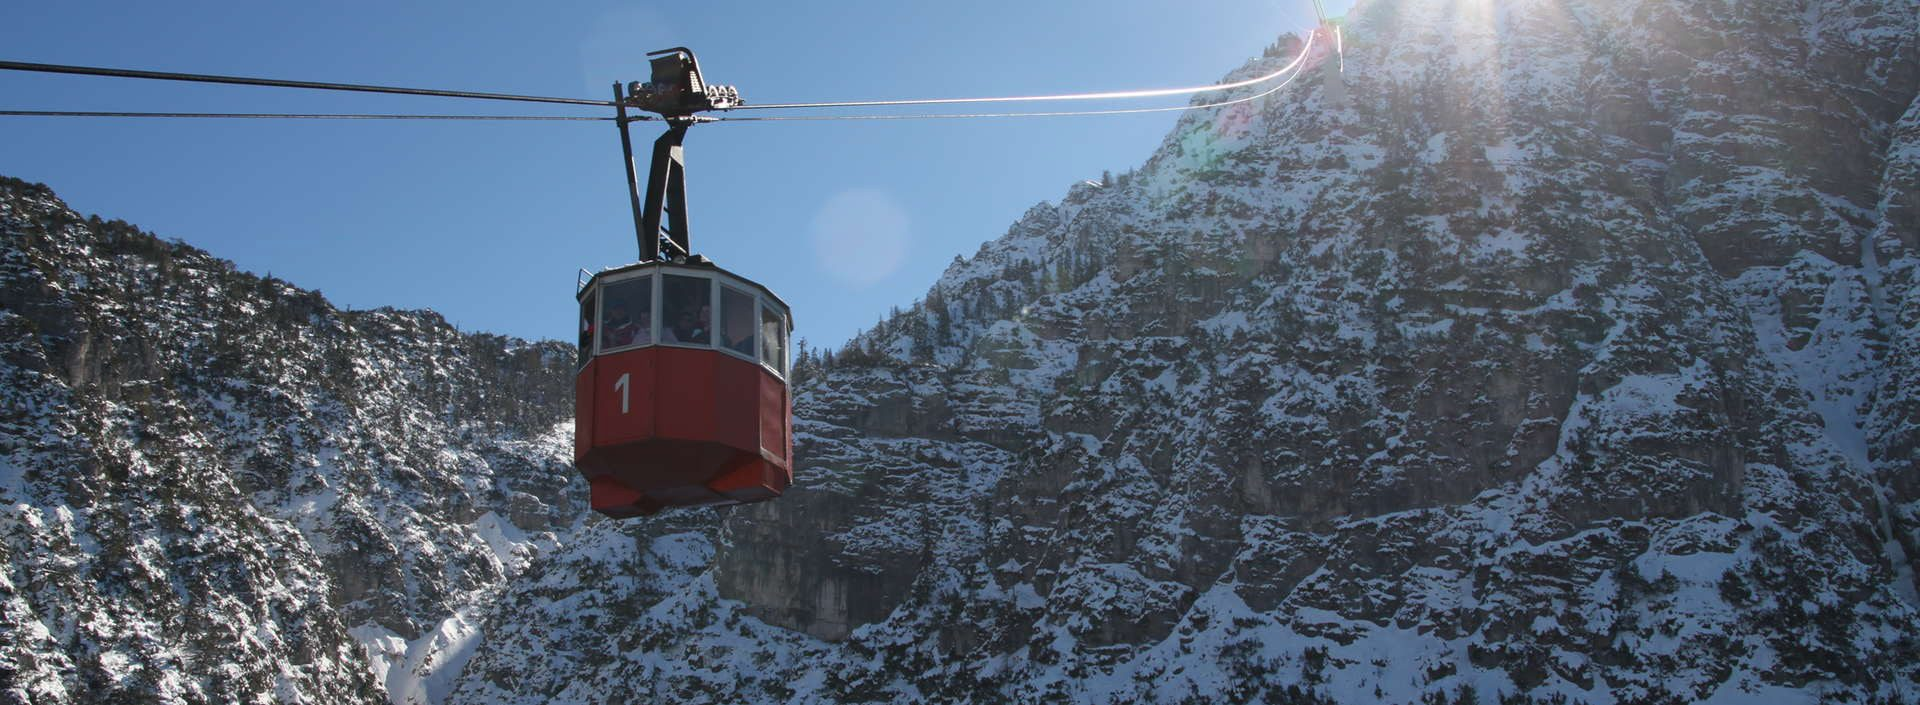 Hotel_Almrausch_a-z_predigtstuhlbahn-winter